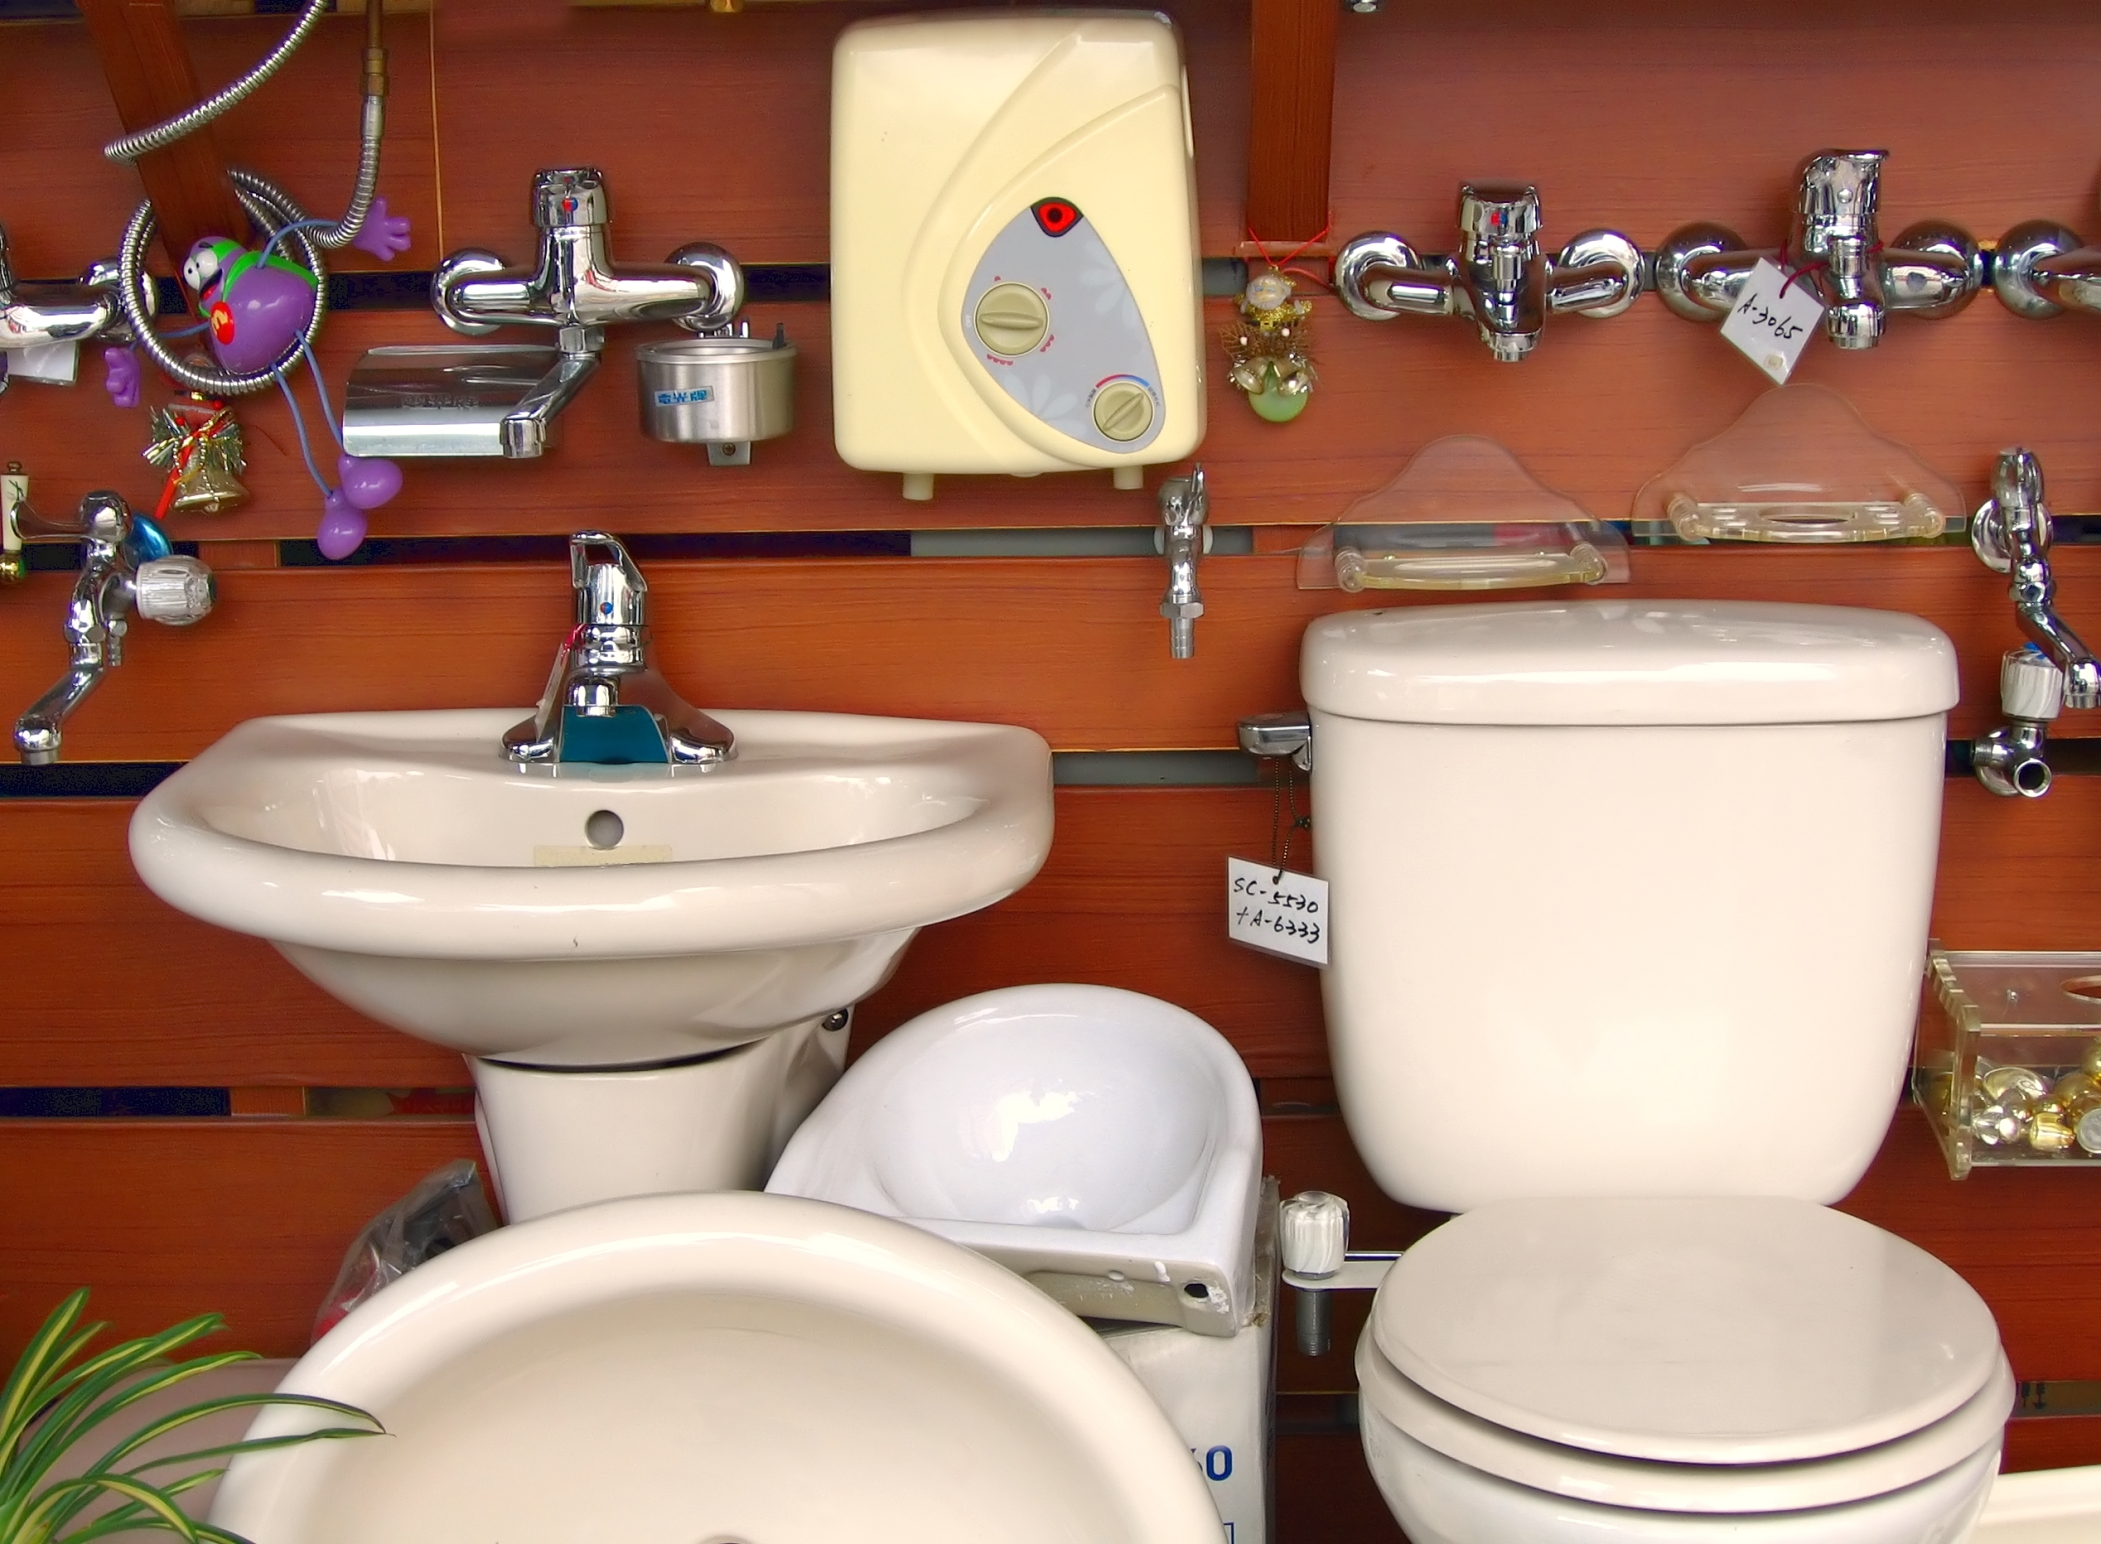 Various Bathroom Fixtures, Attachment, Repair, Hot, Installation, HQ Photo